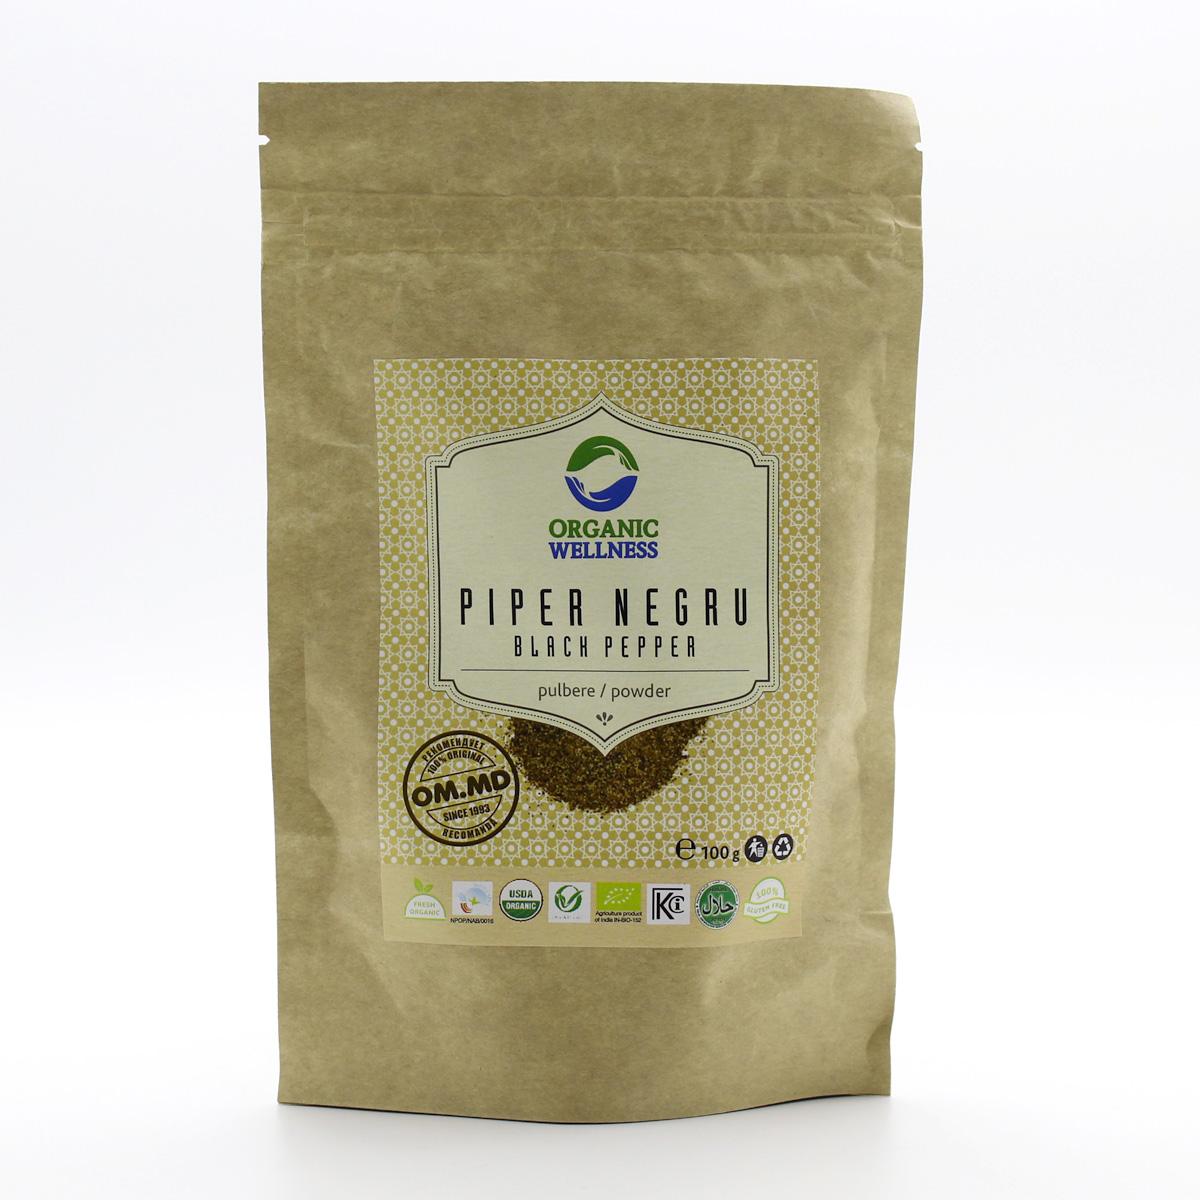 Перец черный молотый (Black Piper) порошок, 100 г, Organic Wellness